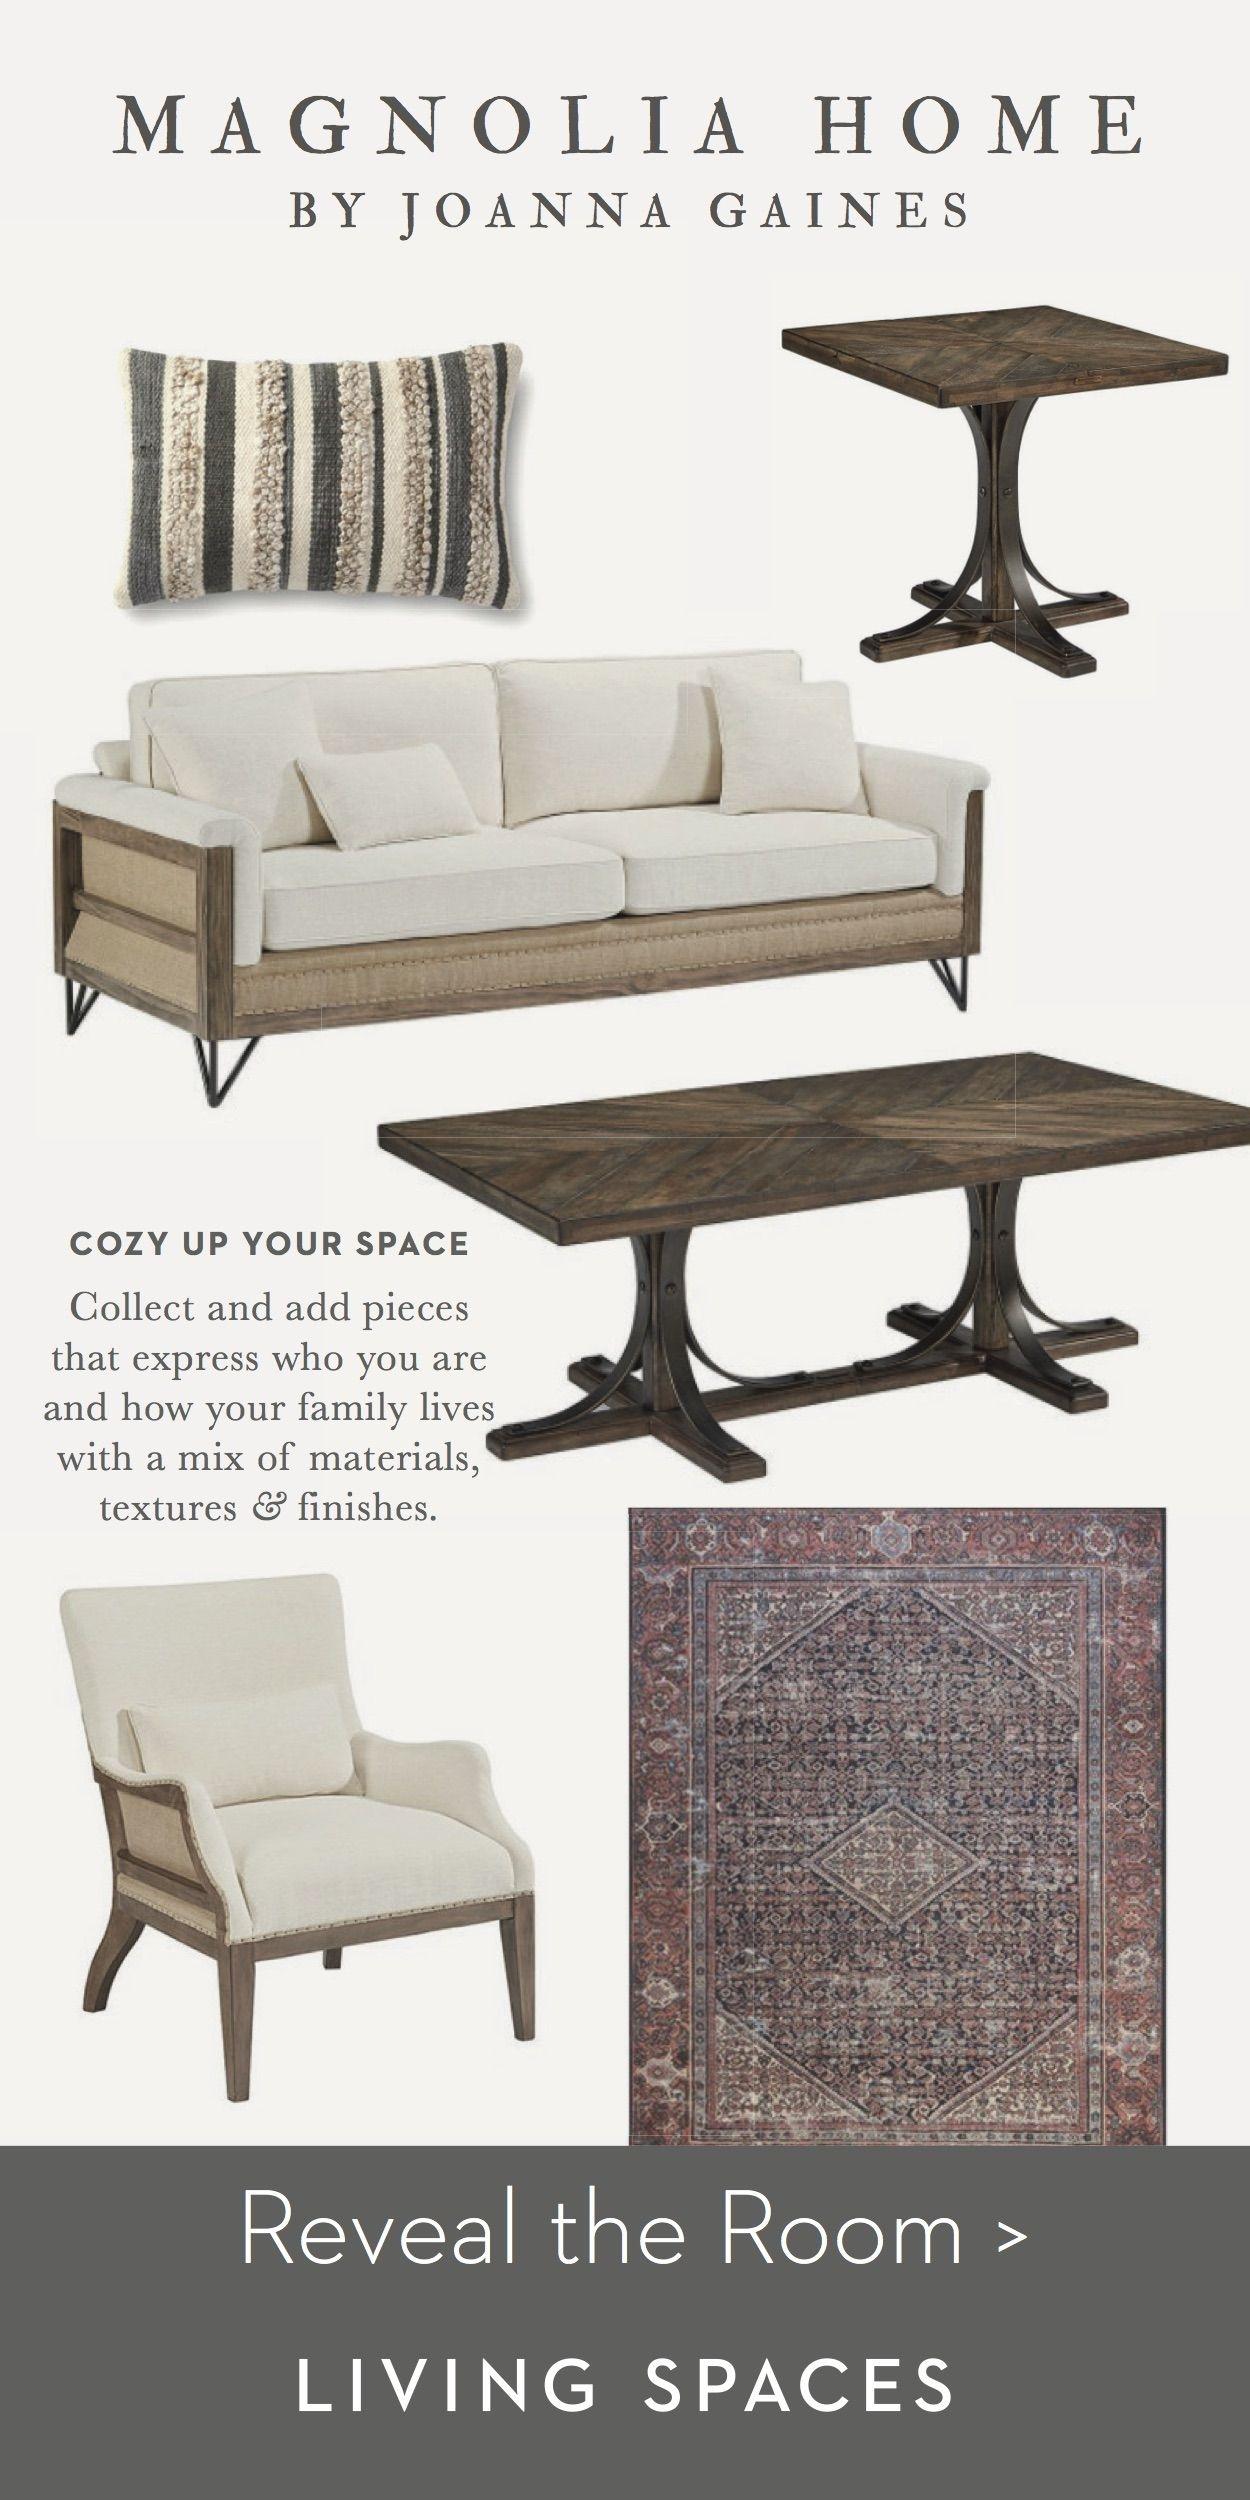 Magnolia Homejoanna Gaines| Living Room Inspiration (Image 25 of 25)